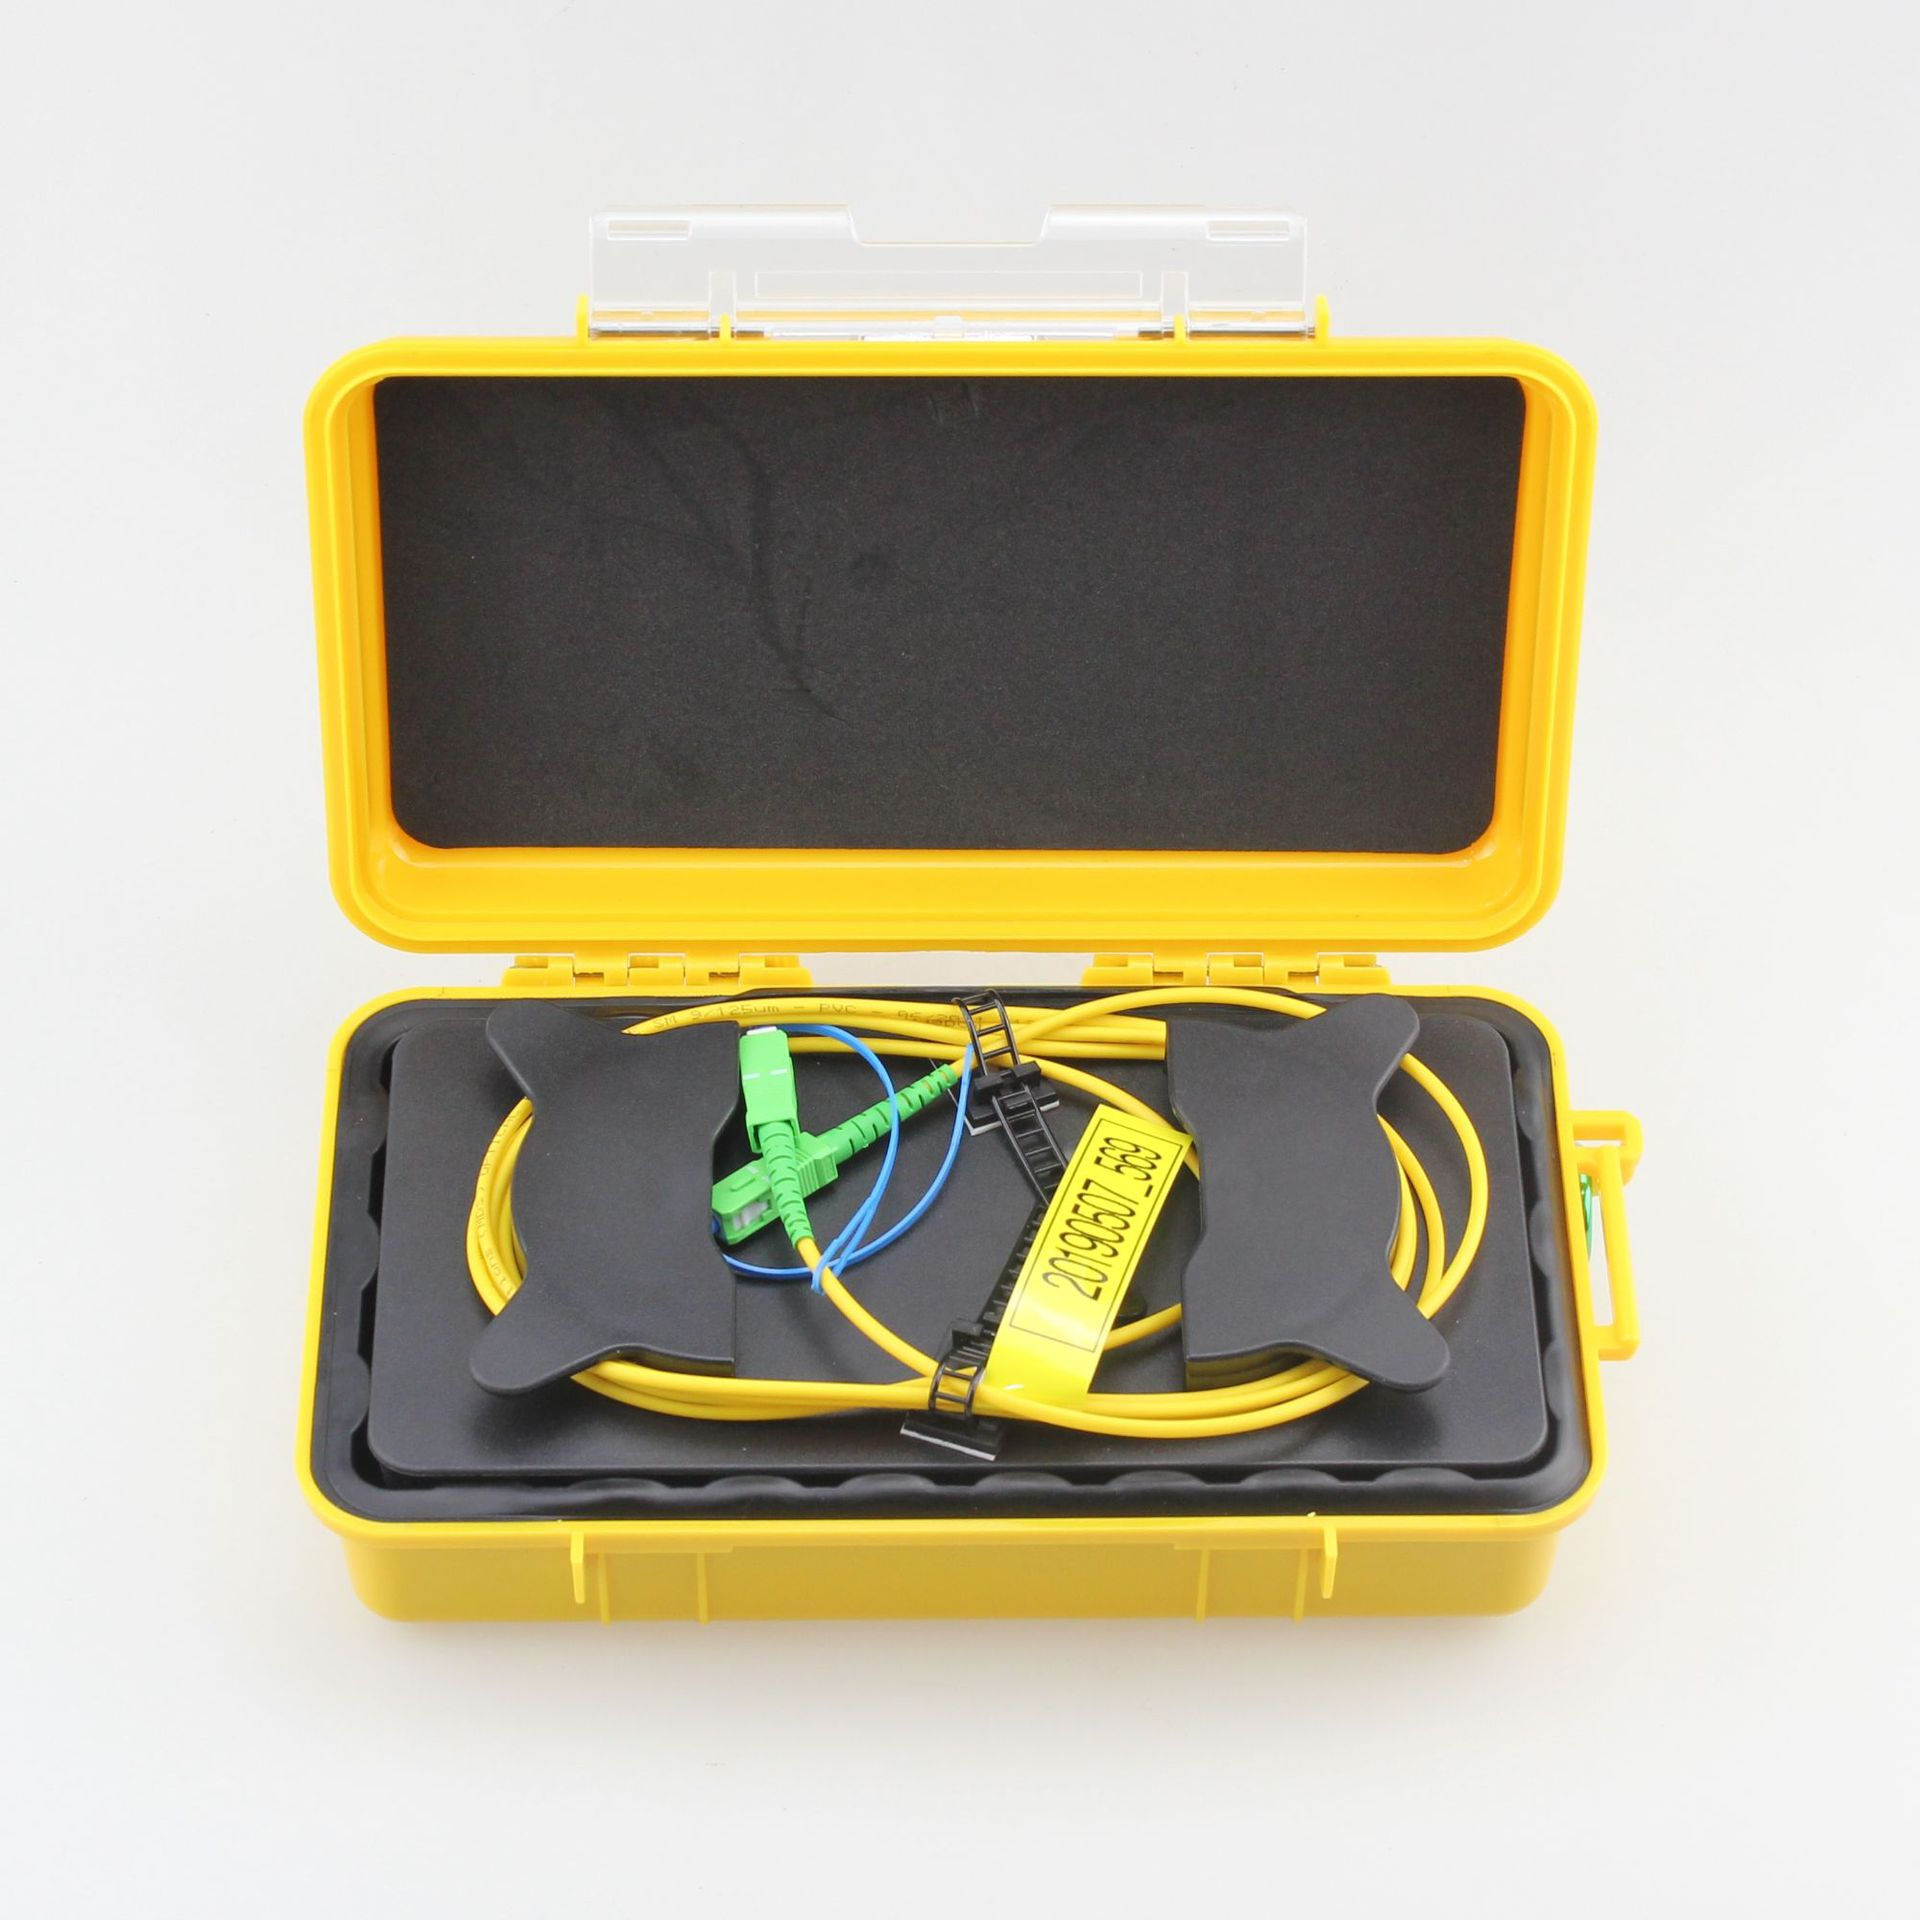 SC/APC-SC/APC OTDR Dead Zone Eliminator,Fiber Rings ,Fiber Optic OTDR Launch Cable Box 1km SM 1310/1550nm Free Shipping